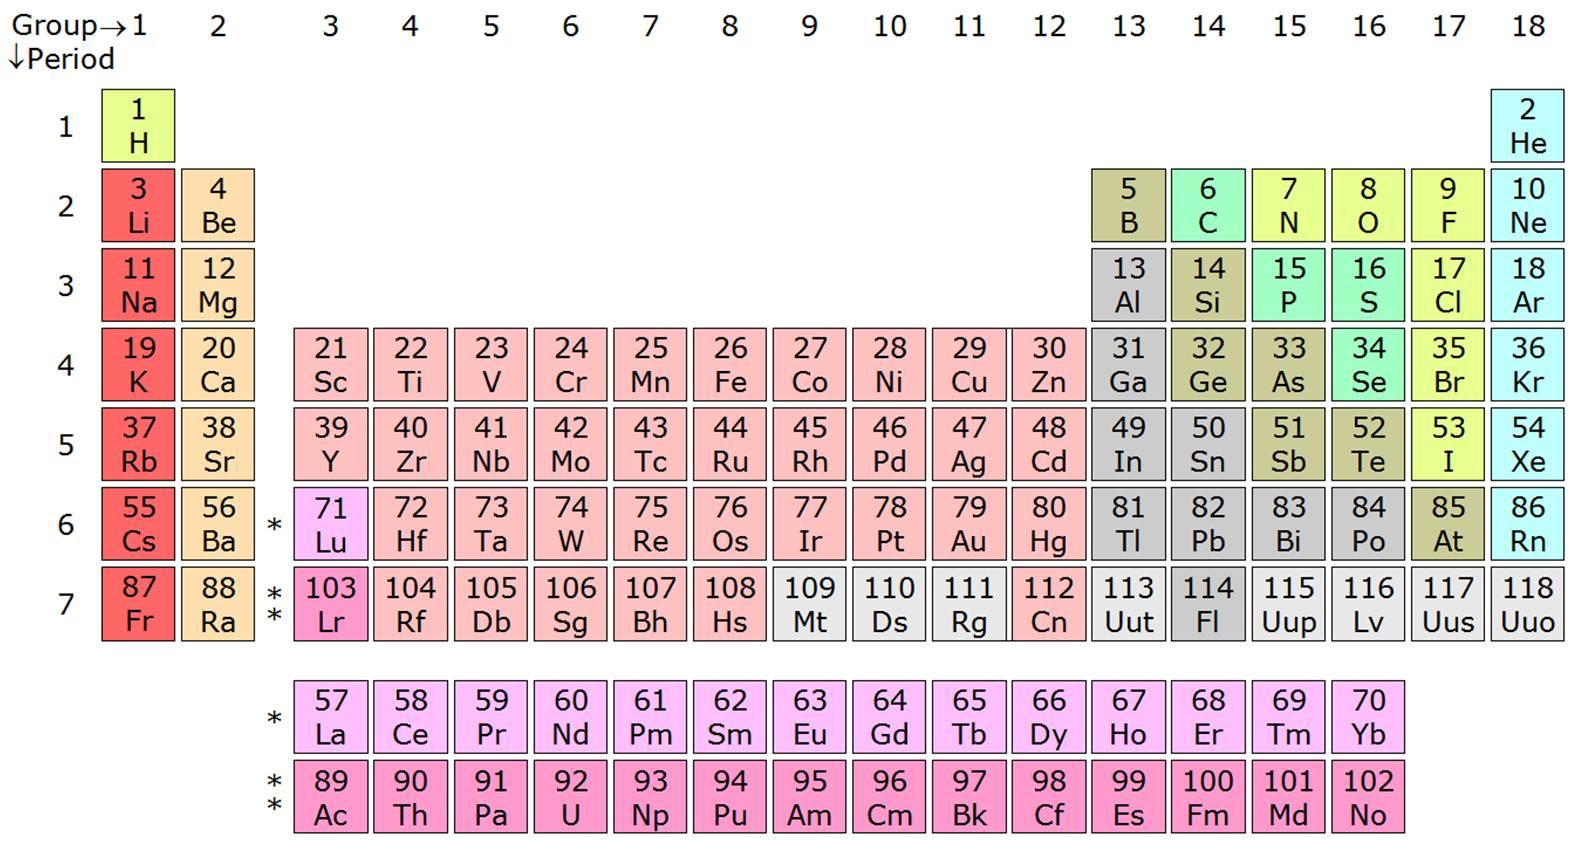 https://en.wikipedia.org/wiki/Periodic_table